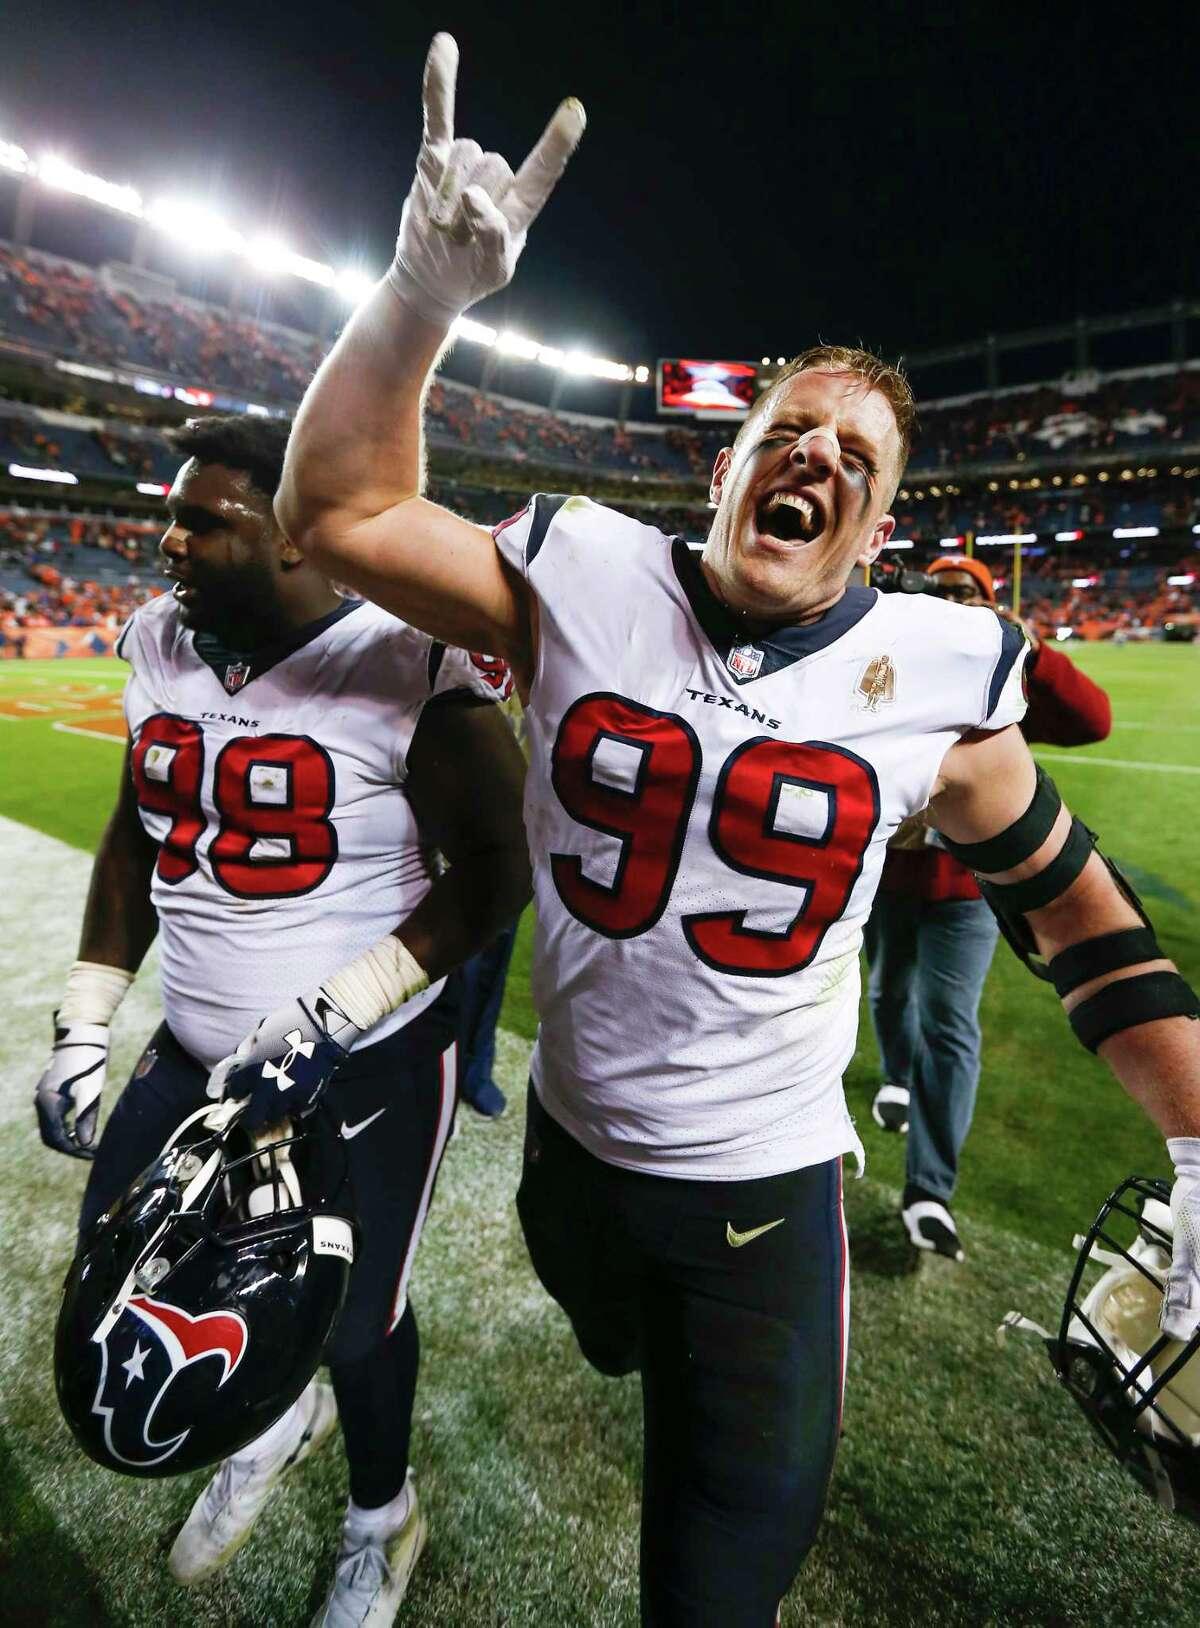 Houston Texans defensive ends D.J. Reader (98) and J.J. Watt (99) celebrate the Texans 19-17 win over the Denver Broncos in an NFL football game at Broncos Stadium at Mile High on Sunday, Nov. 4, 2018, in Denver.